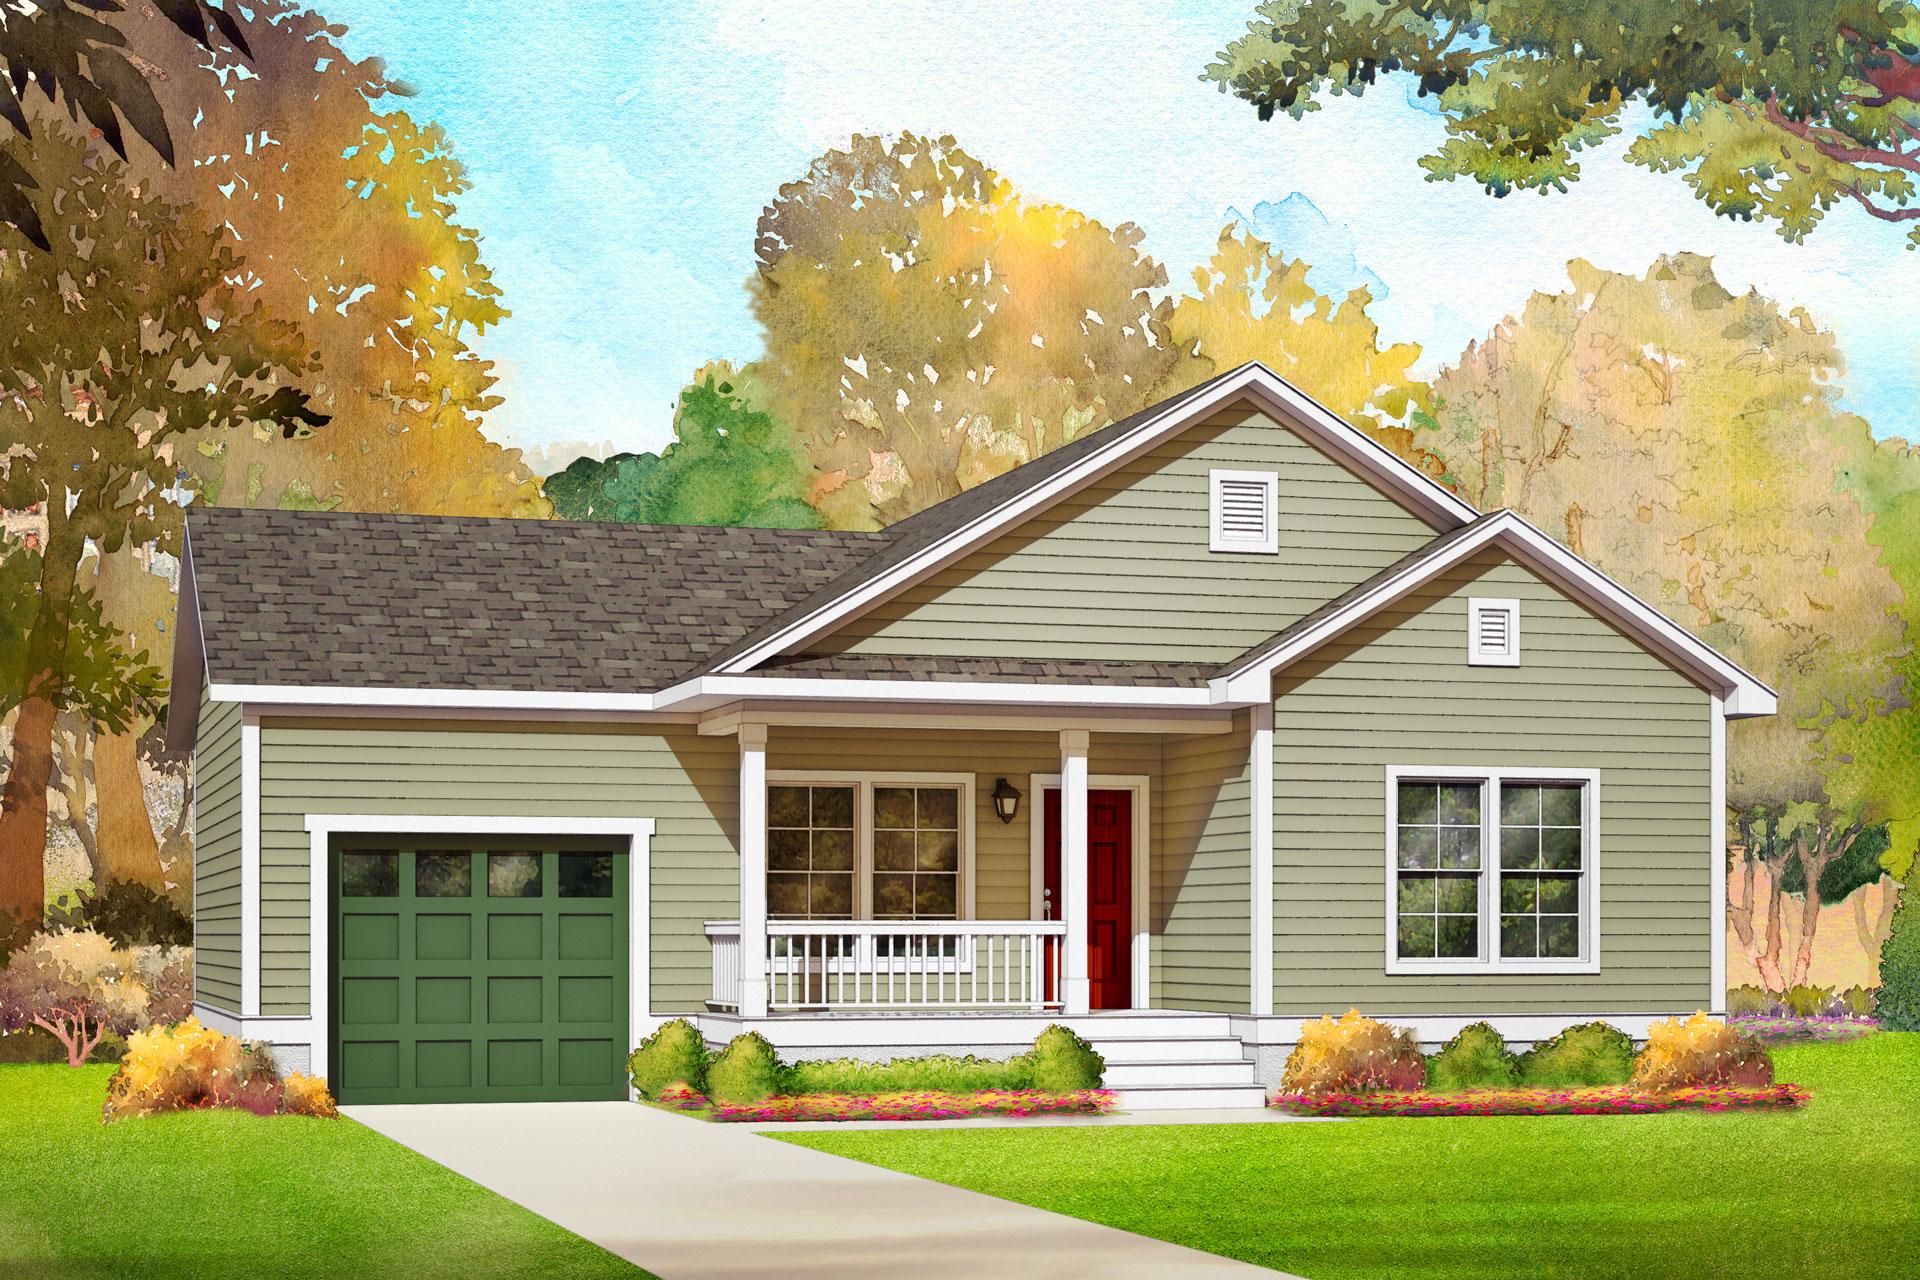 grove modular home rendering